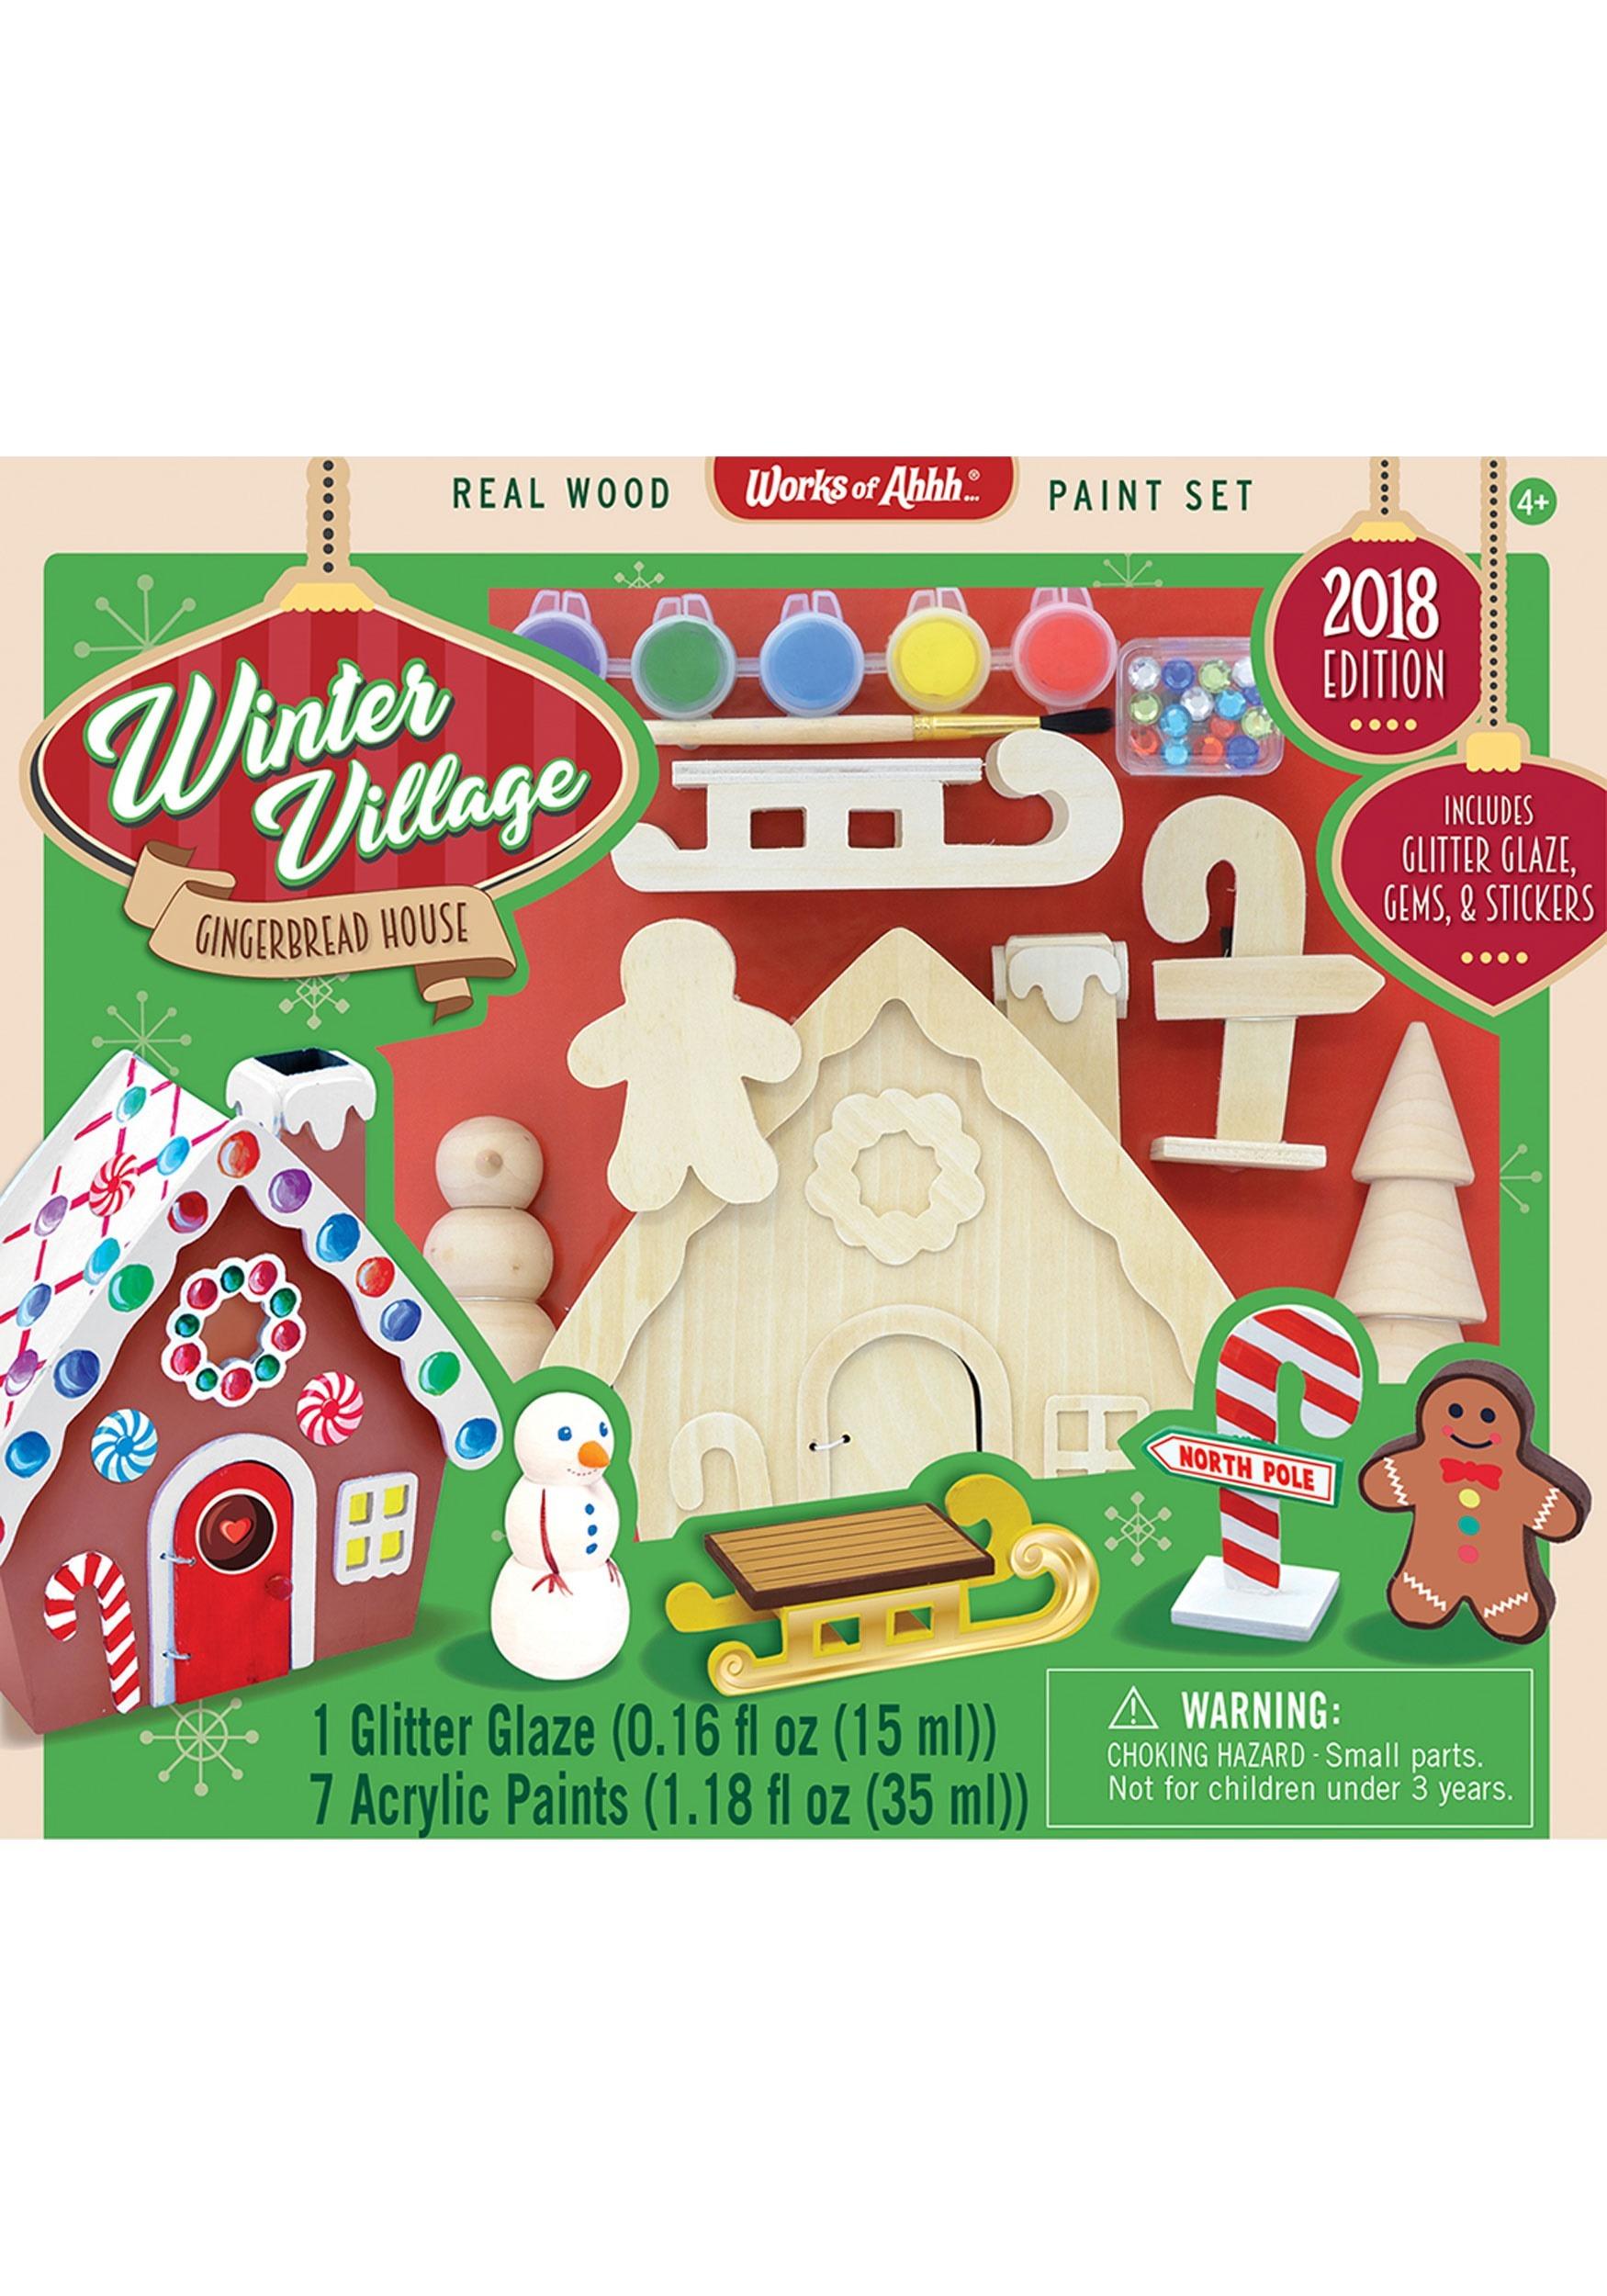 Works of Ahhh Gingerbread Village